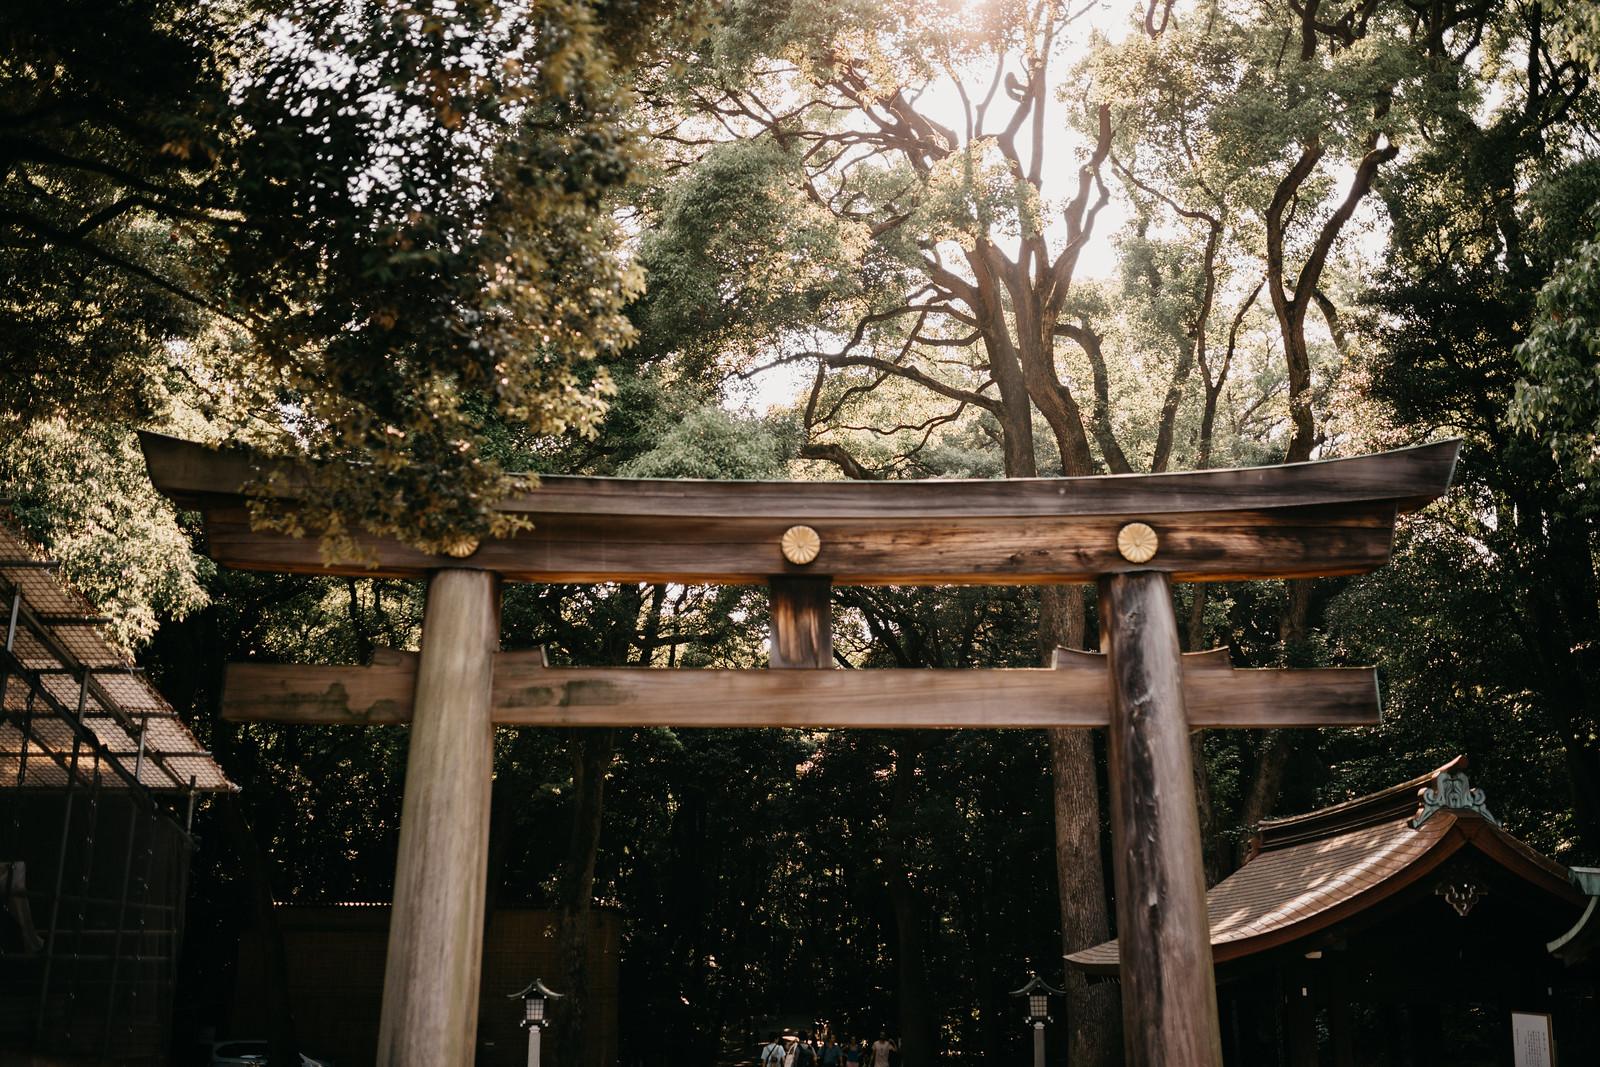 Entrance of Meiji Jingu Shrine in Yoyogi Park Tokyo Japan surrounded by forest